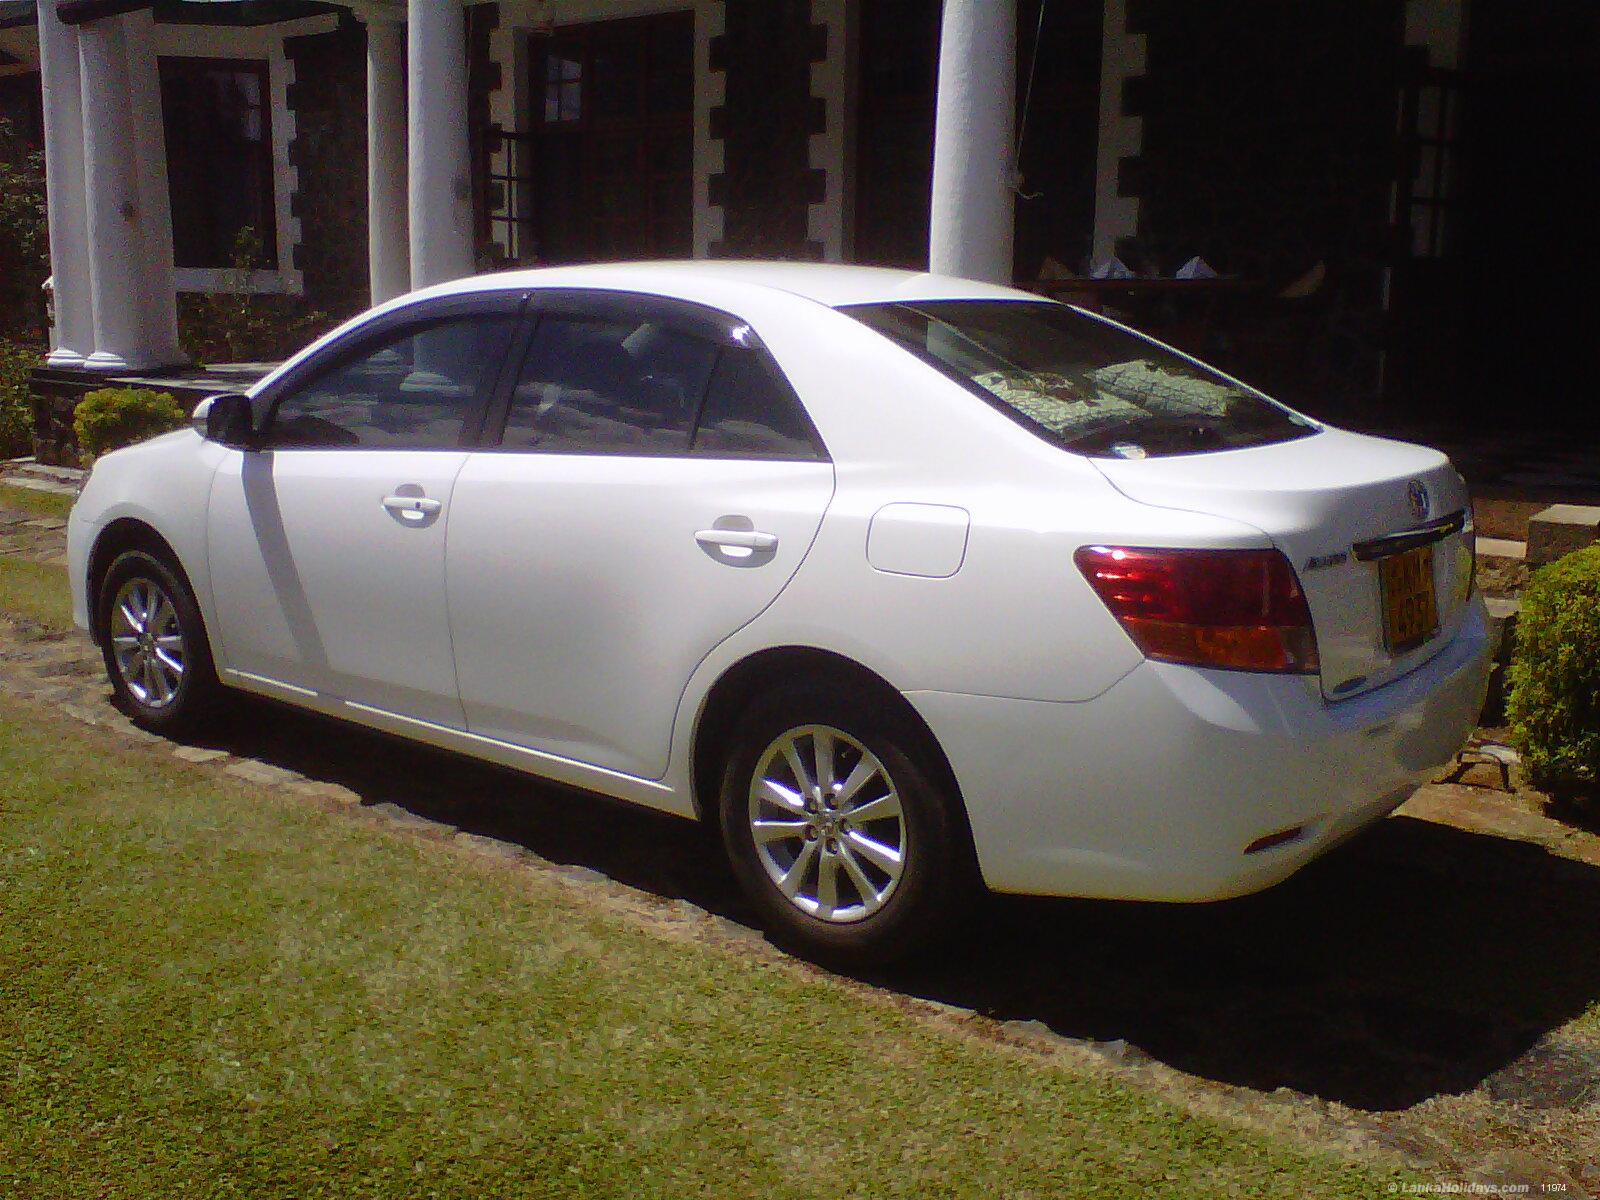 Sri Lanka Car Rentals Hire Car With English Speaking